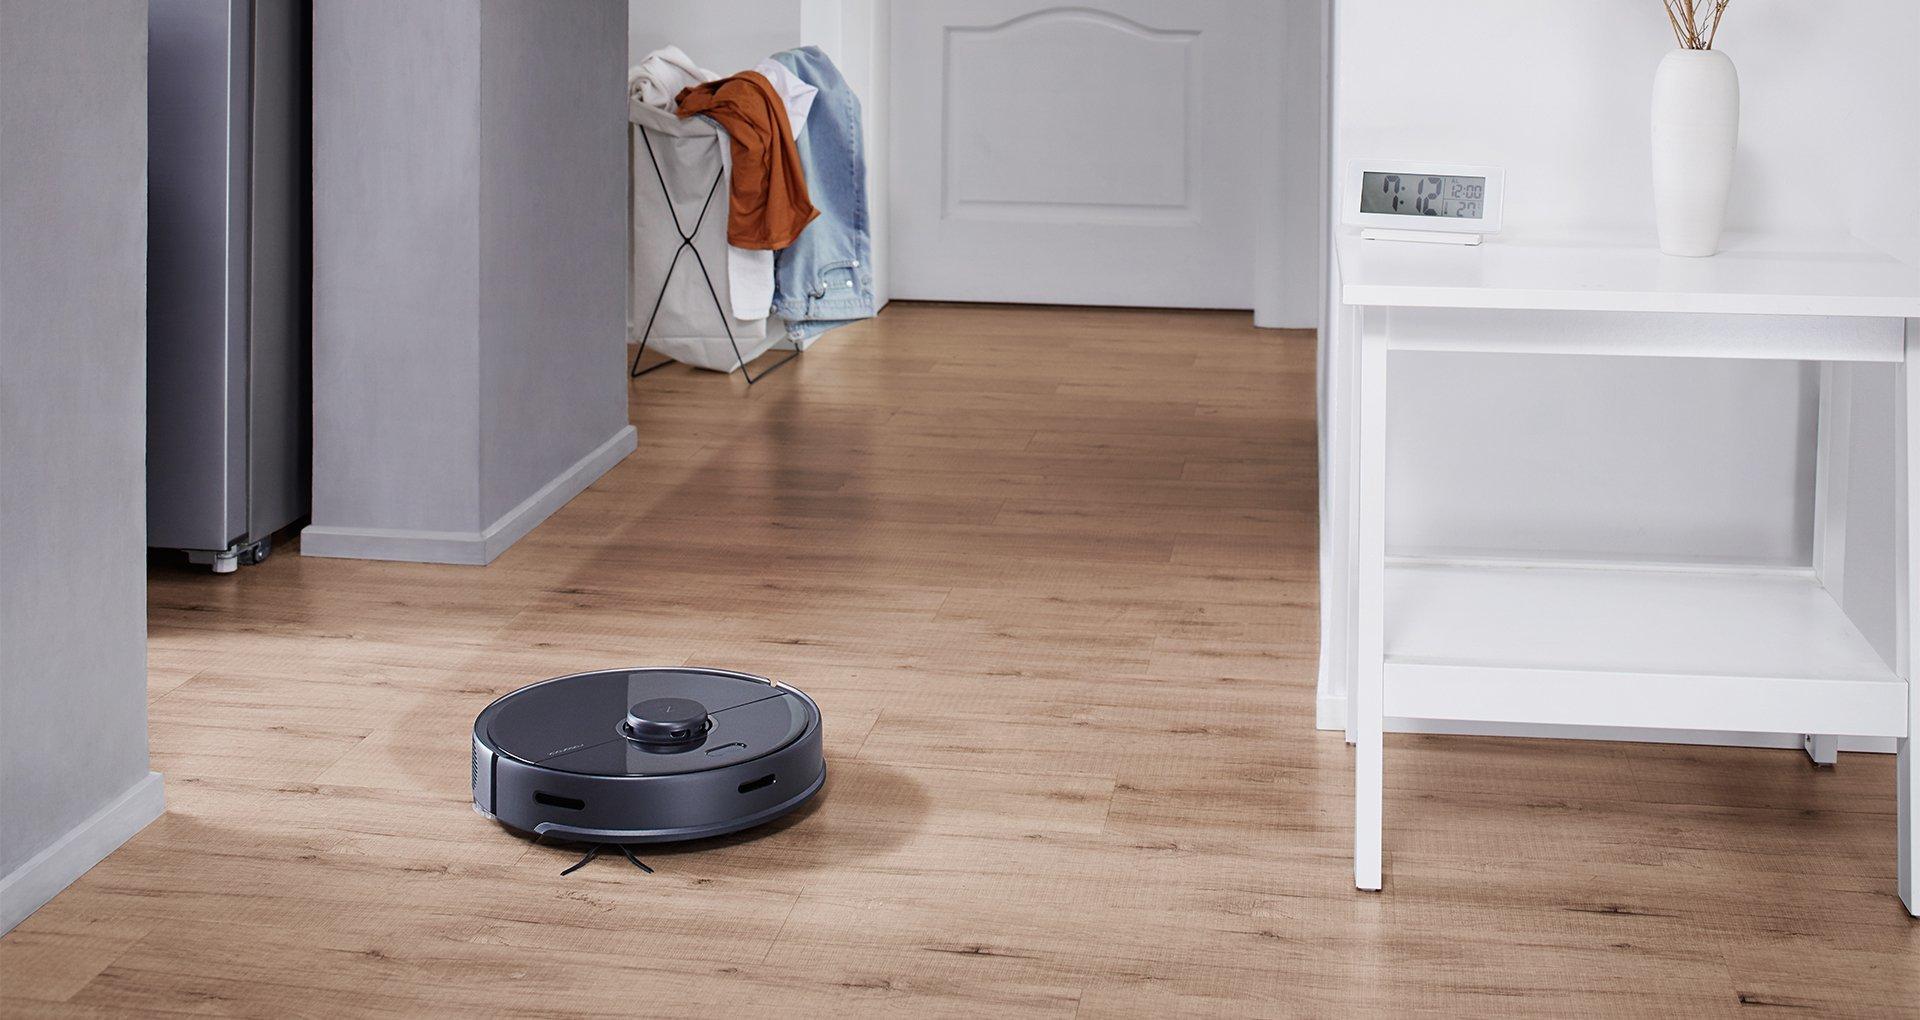 Aspirateur robot S5 MAX - Blanc